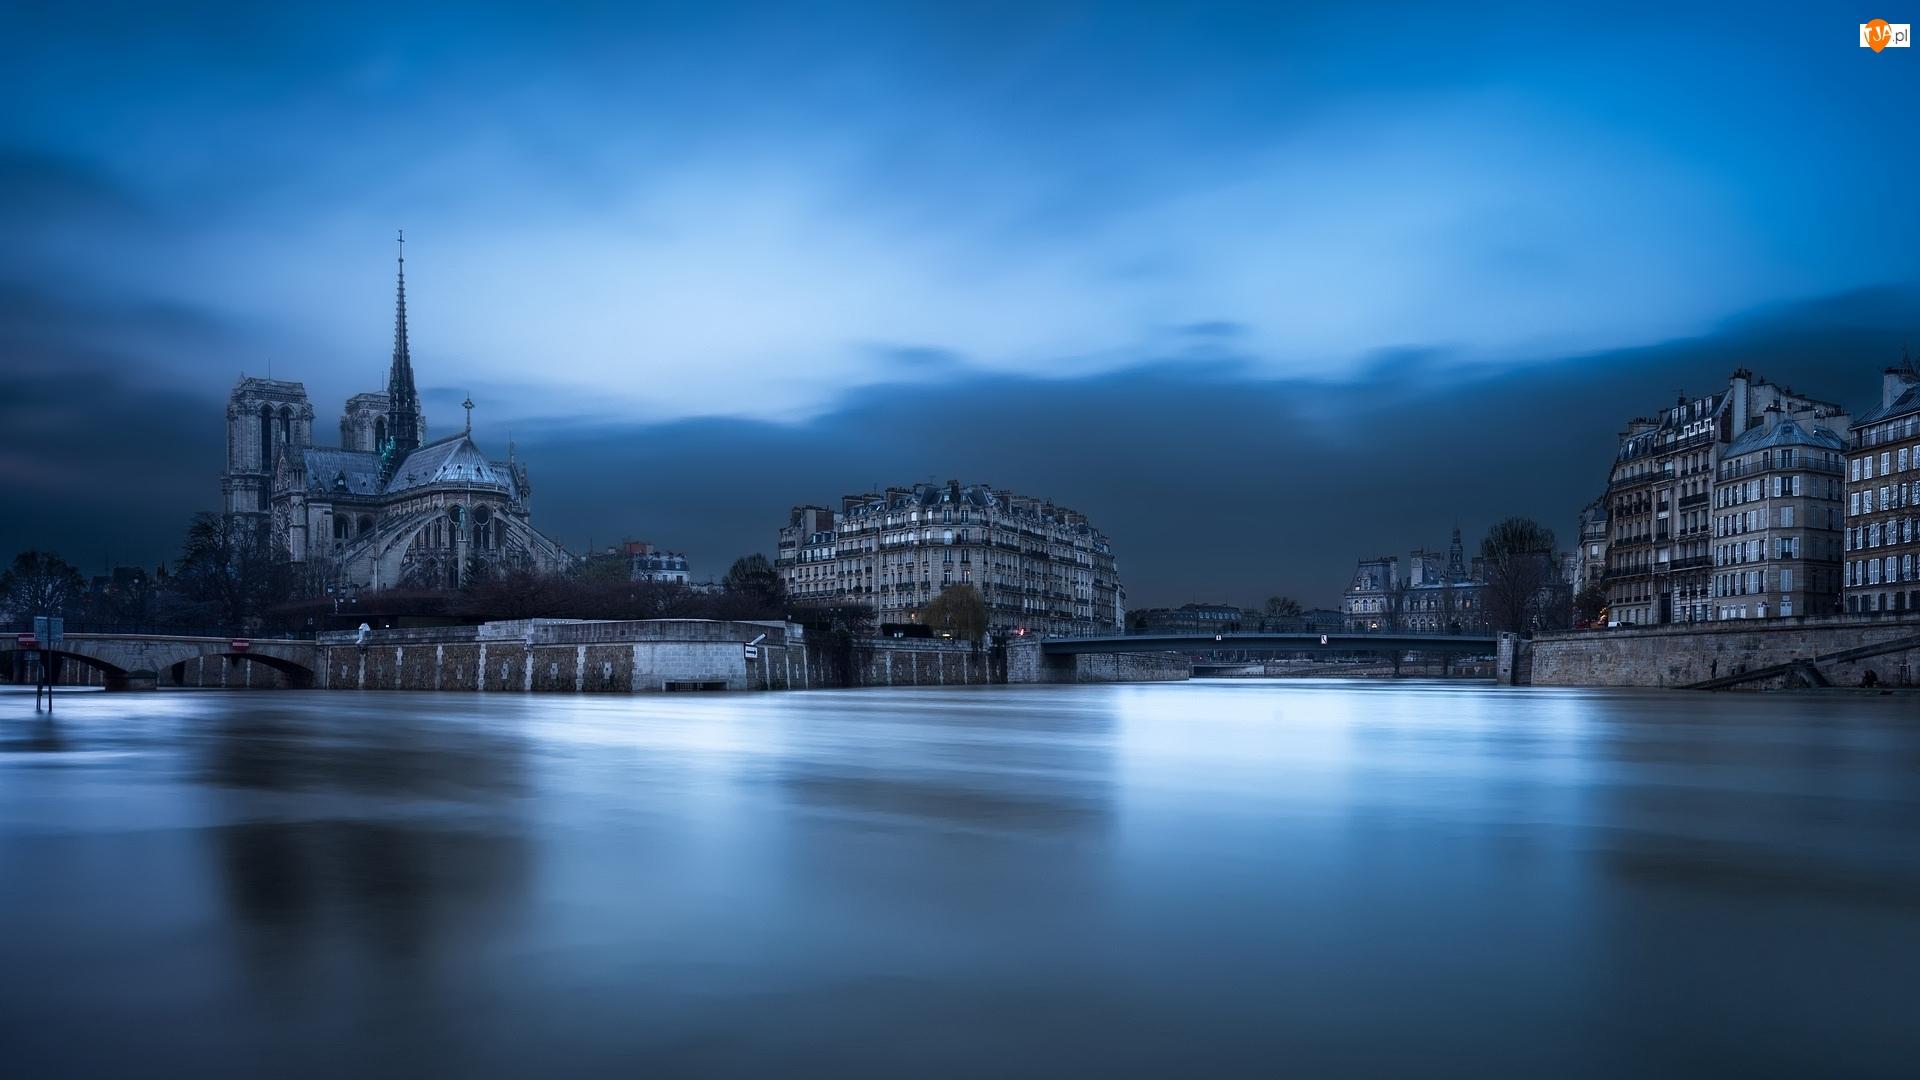 Rzeka Sekwana, Domy, Paryż, Francja, Katedra Notre-Dame